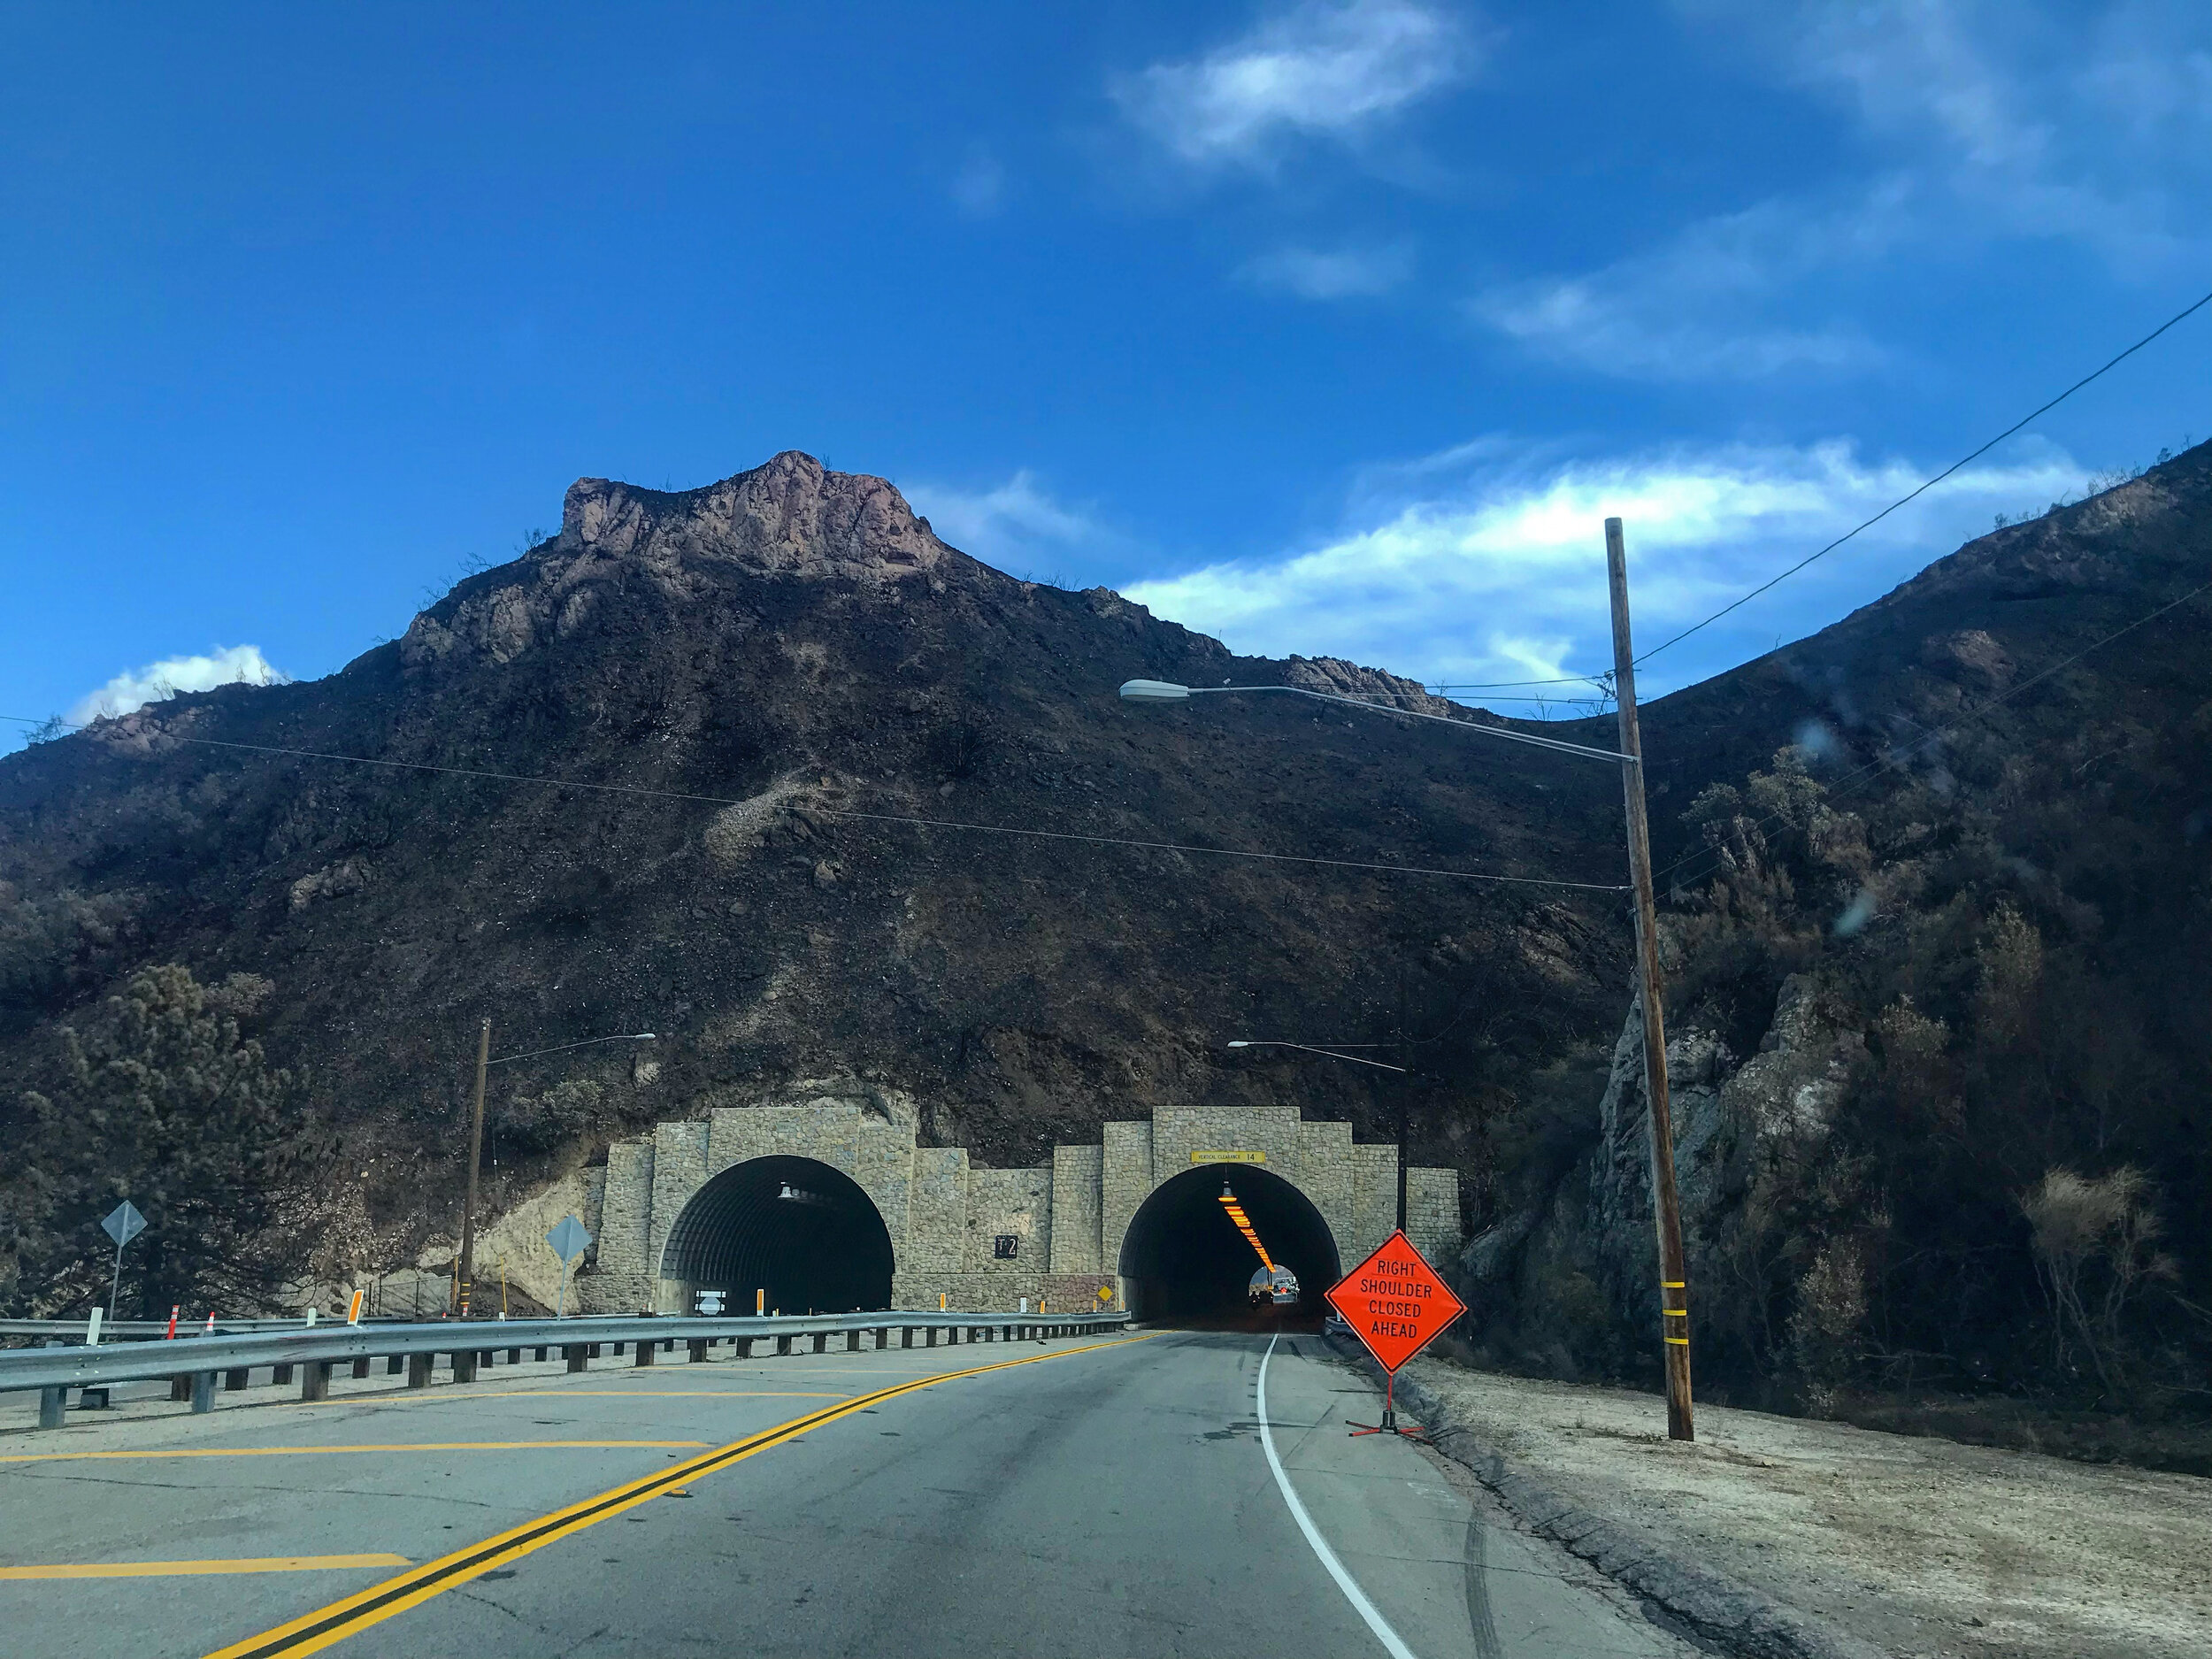 November 22, 2108 - Kanan Road Tunnels surrounded by black and burned mountains (📷: Lisa Butala Zabaldo)